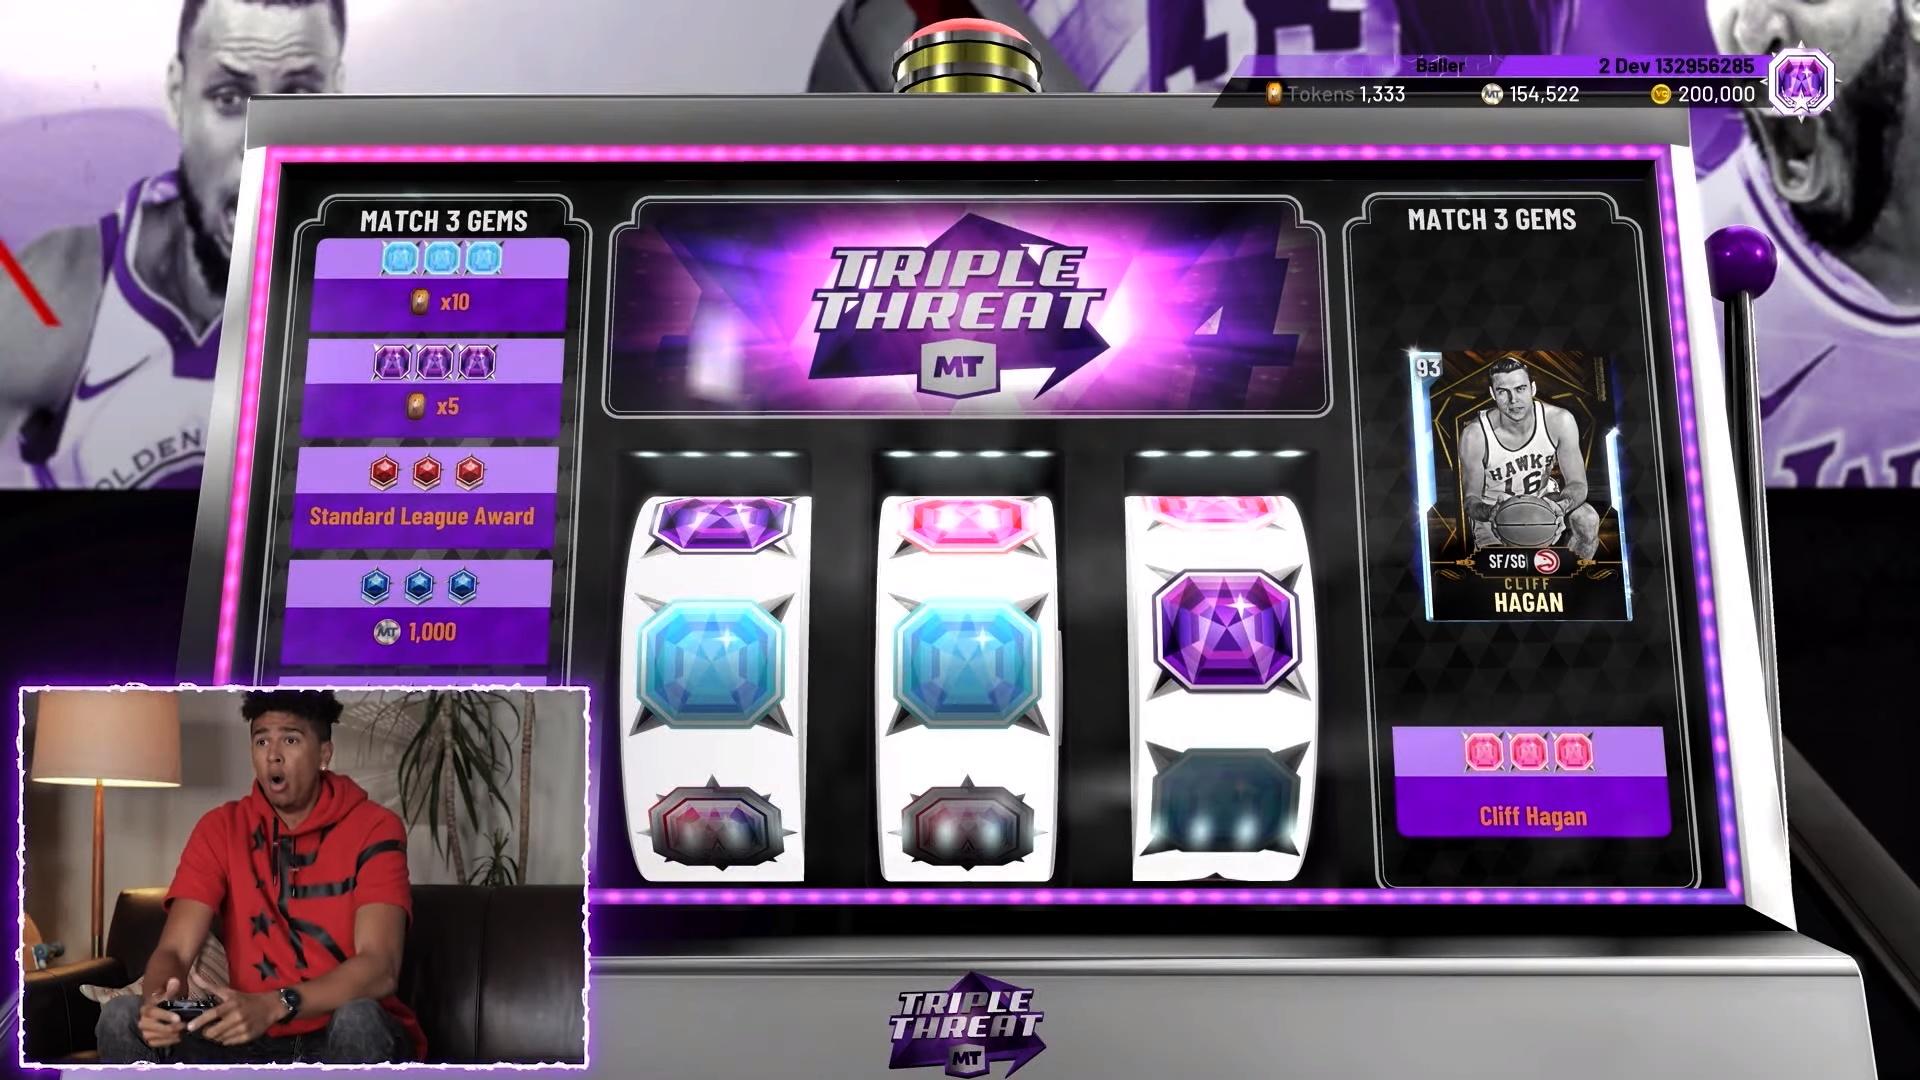 Gamestar Online Casino